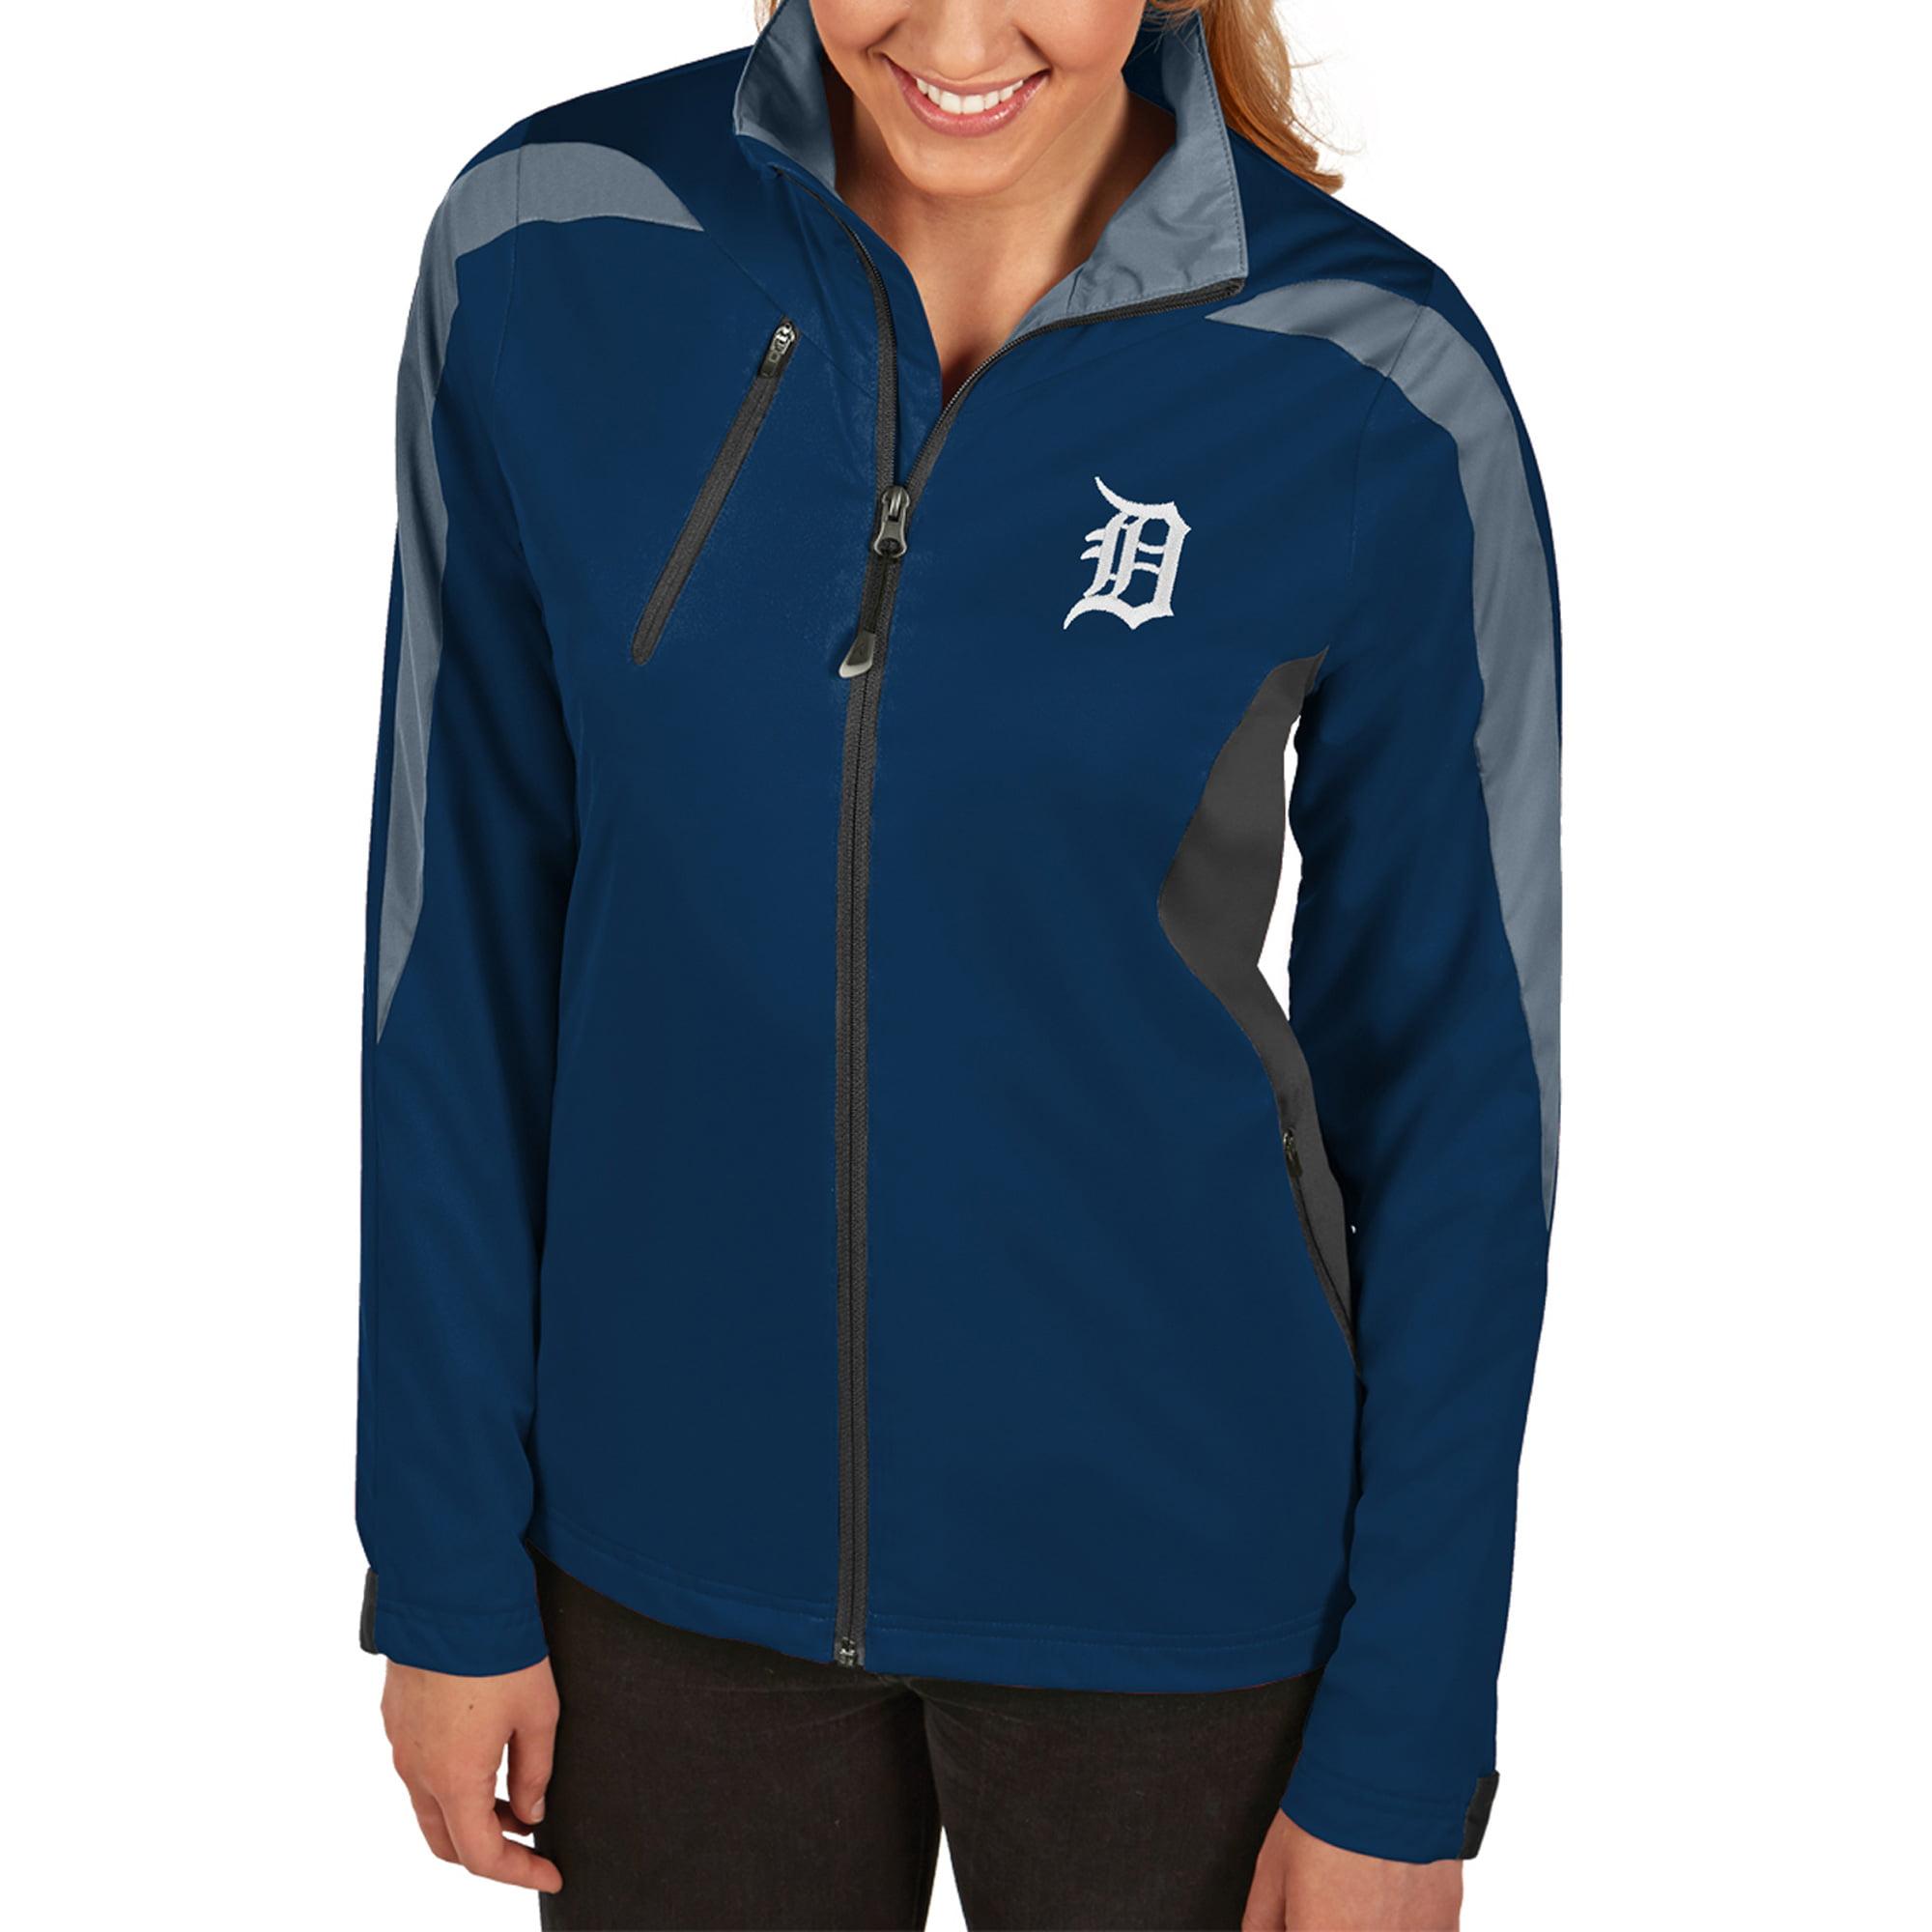 Detroit Tigers Antigua Women's Discover Full-Zip Jacket - Navy